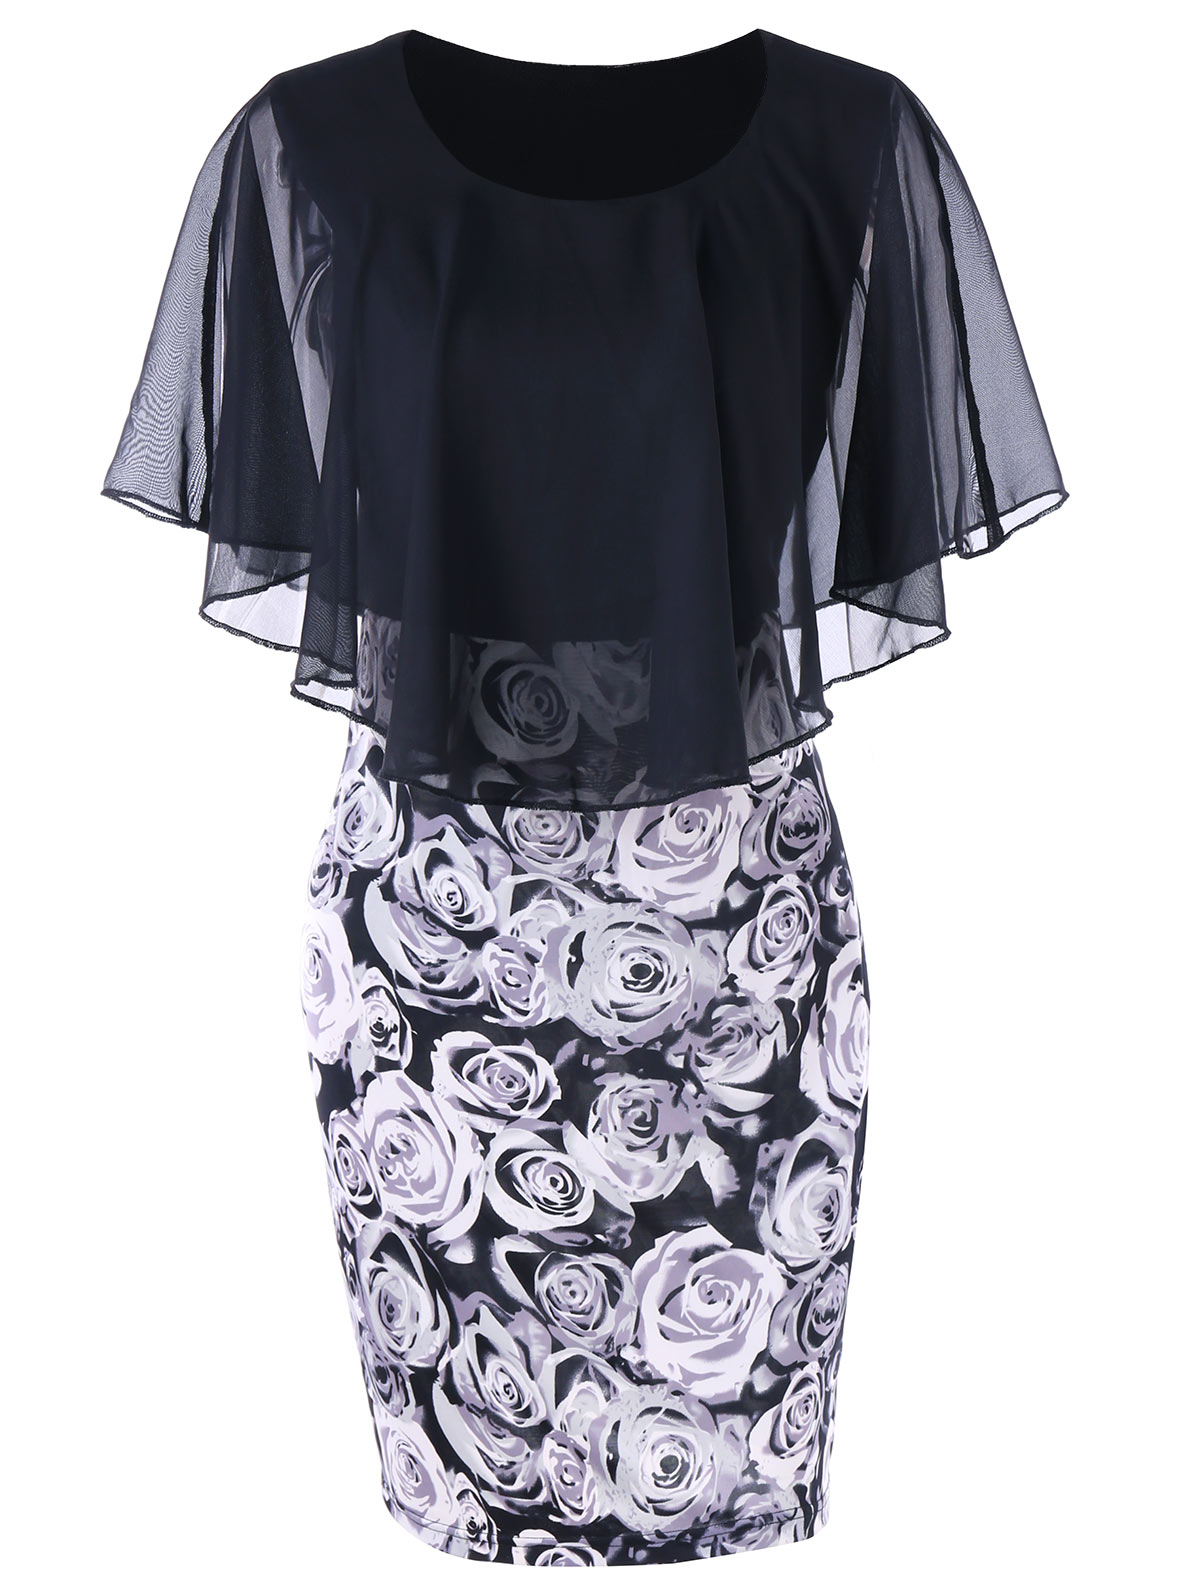 Gamiss Plus Size Dress Summer Rhinestone Embellished Glittery Scalloped Capelet Bodycon Dress Women OL Pencil Dresses Vestidos